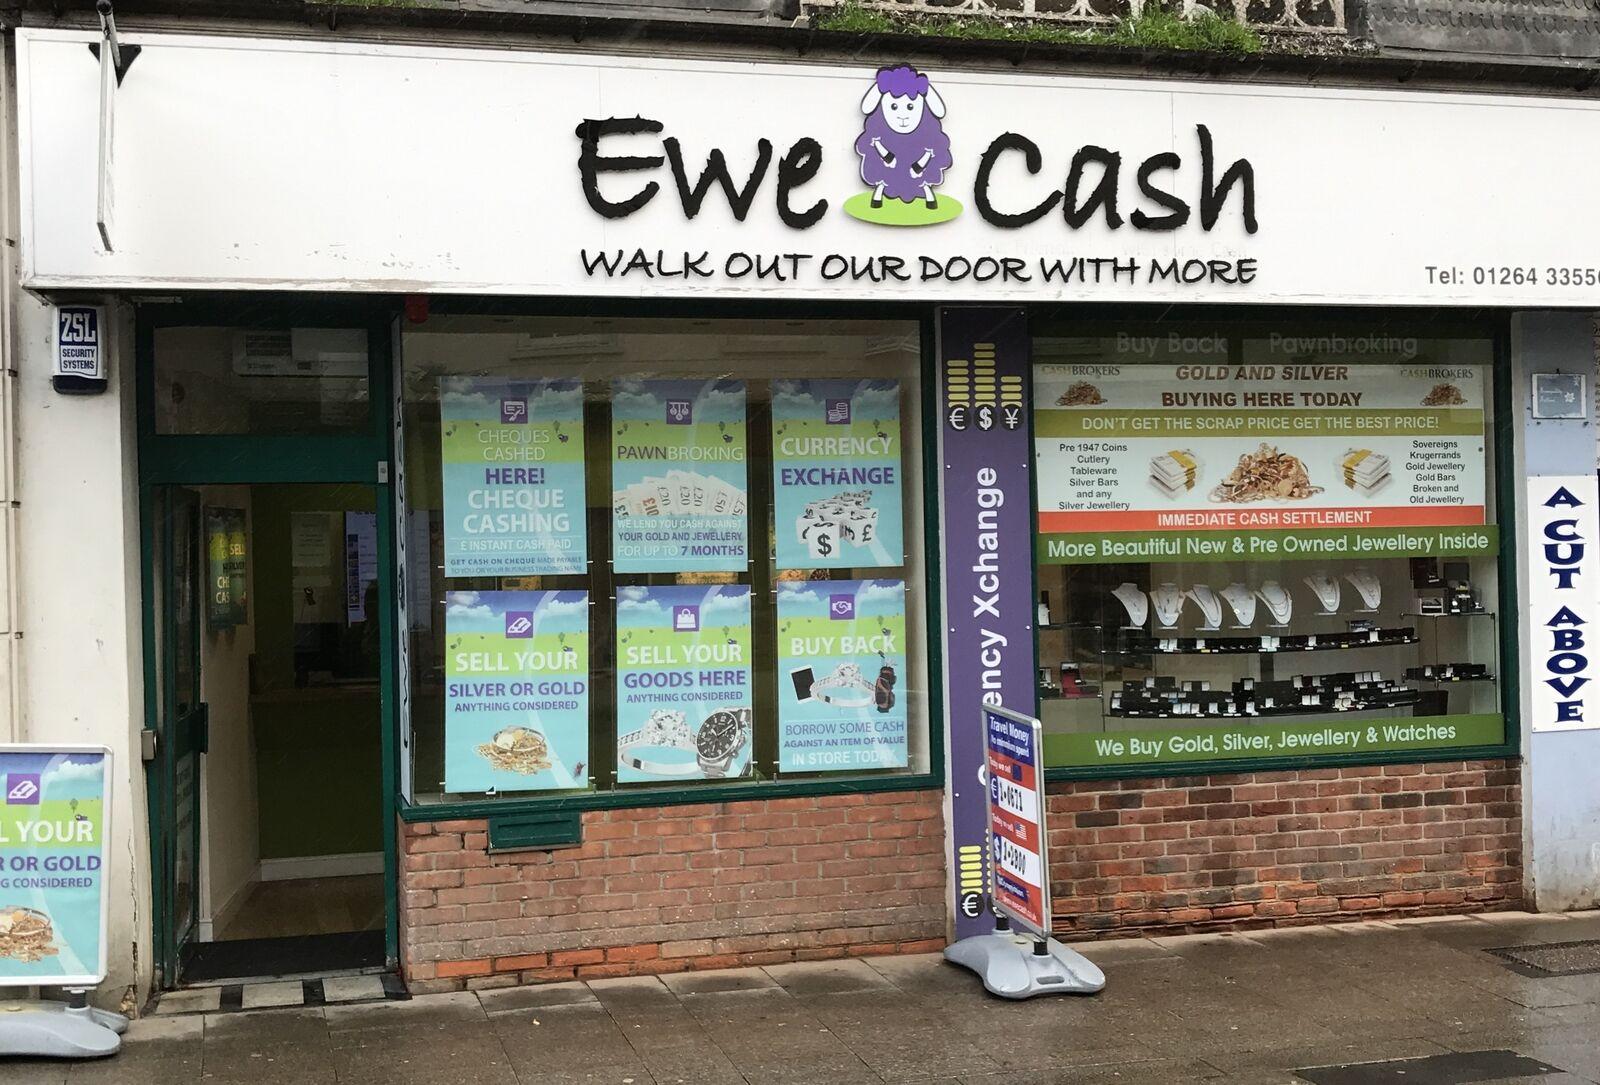 Ewe Cash